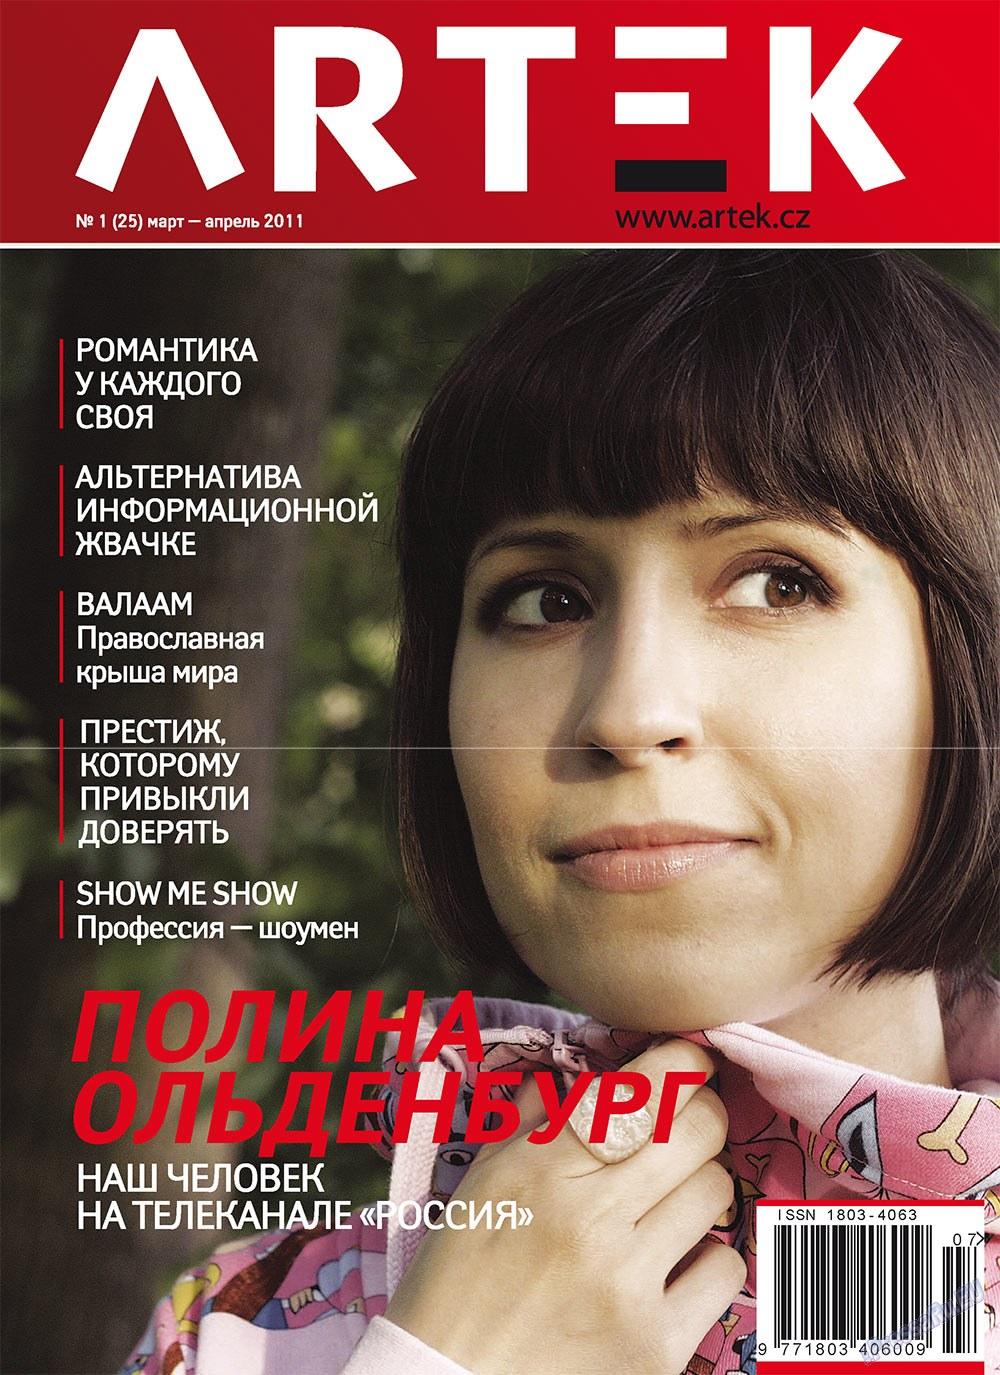 Артек (журнал). 2011 год, номер 1, стр. 1